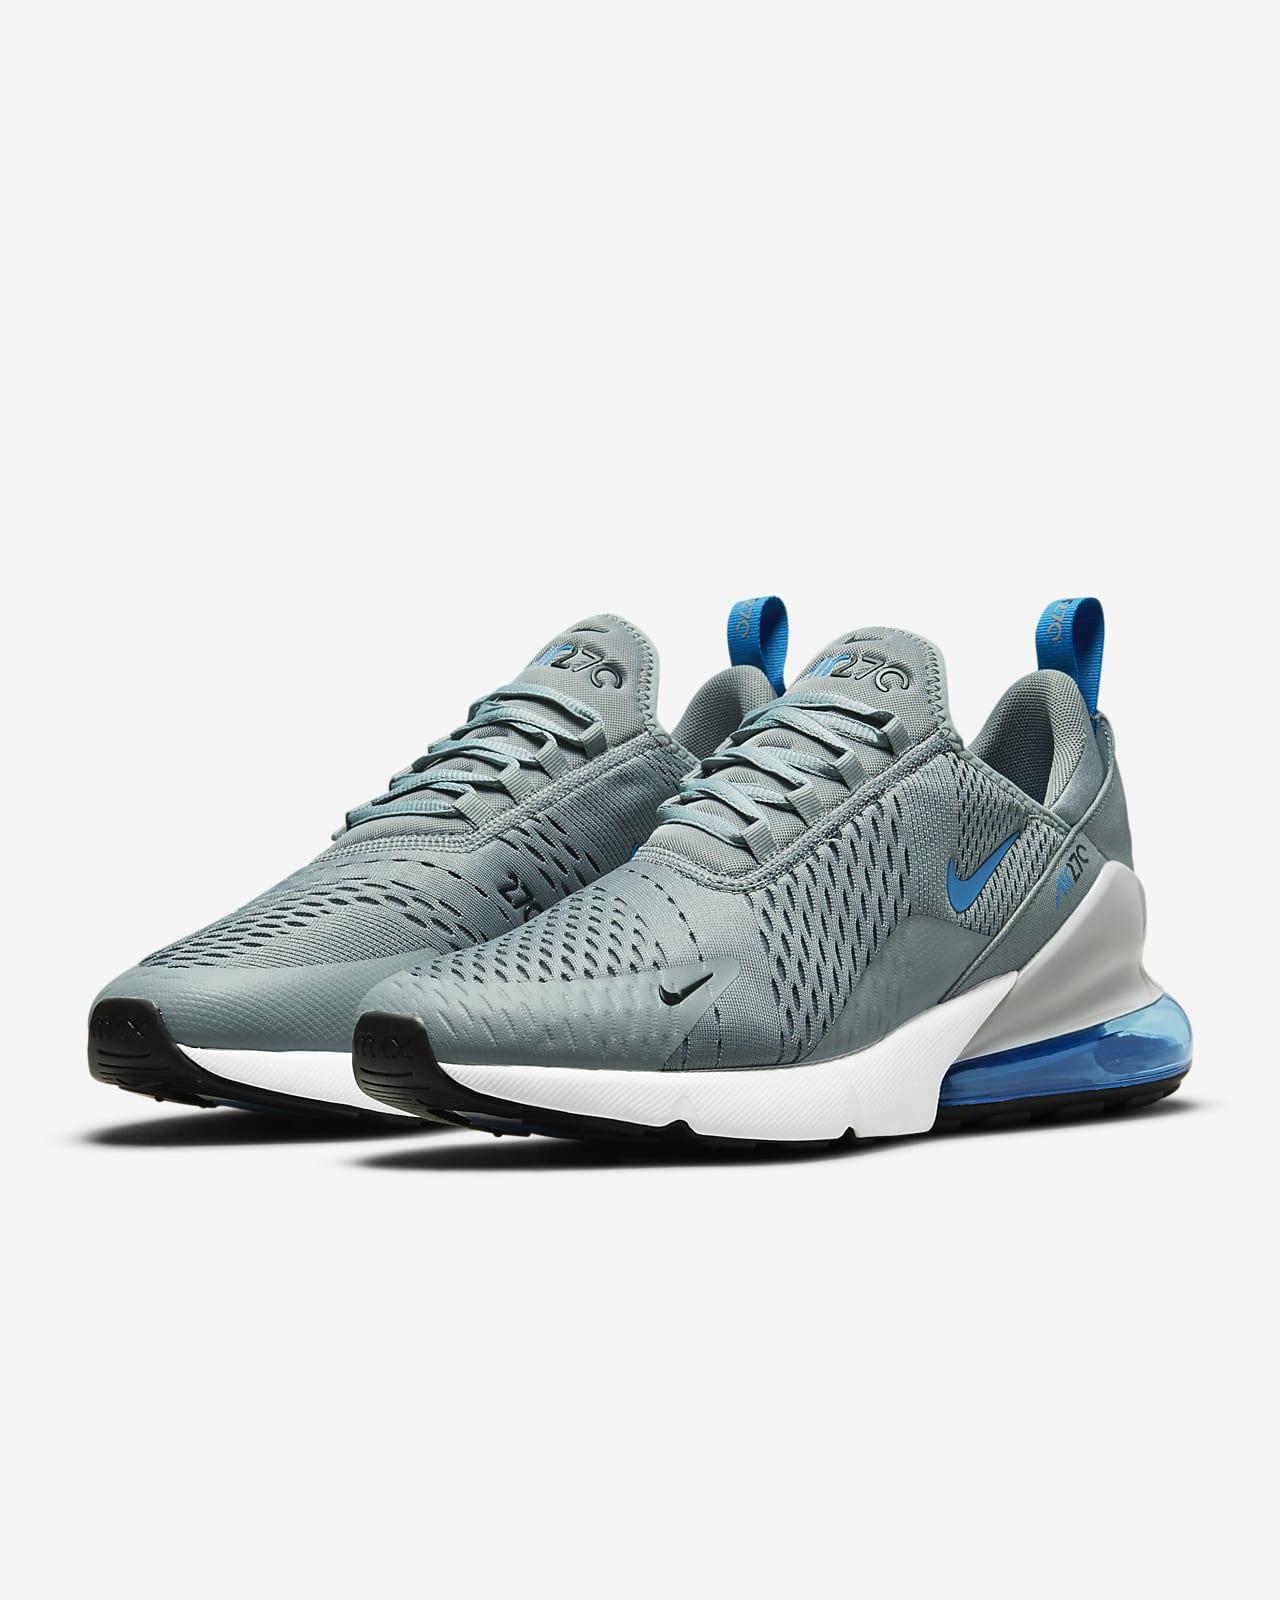 Nike Air Max 270 Essential Men's Shoes